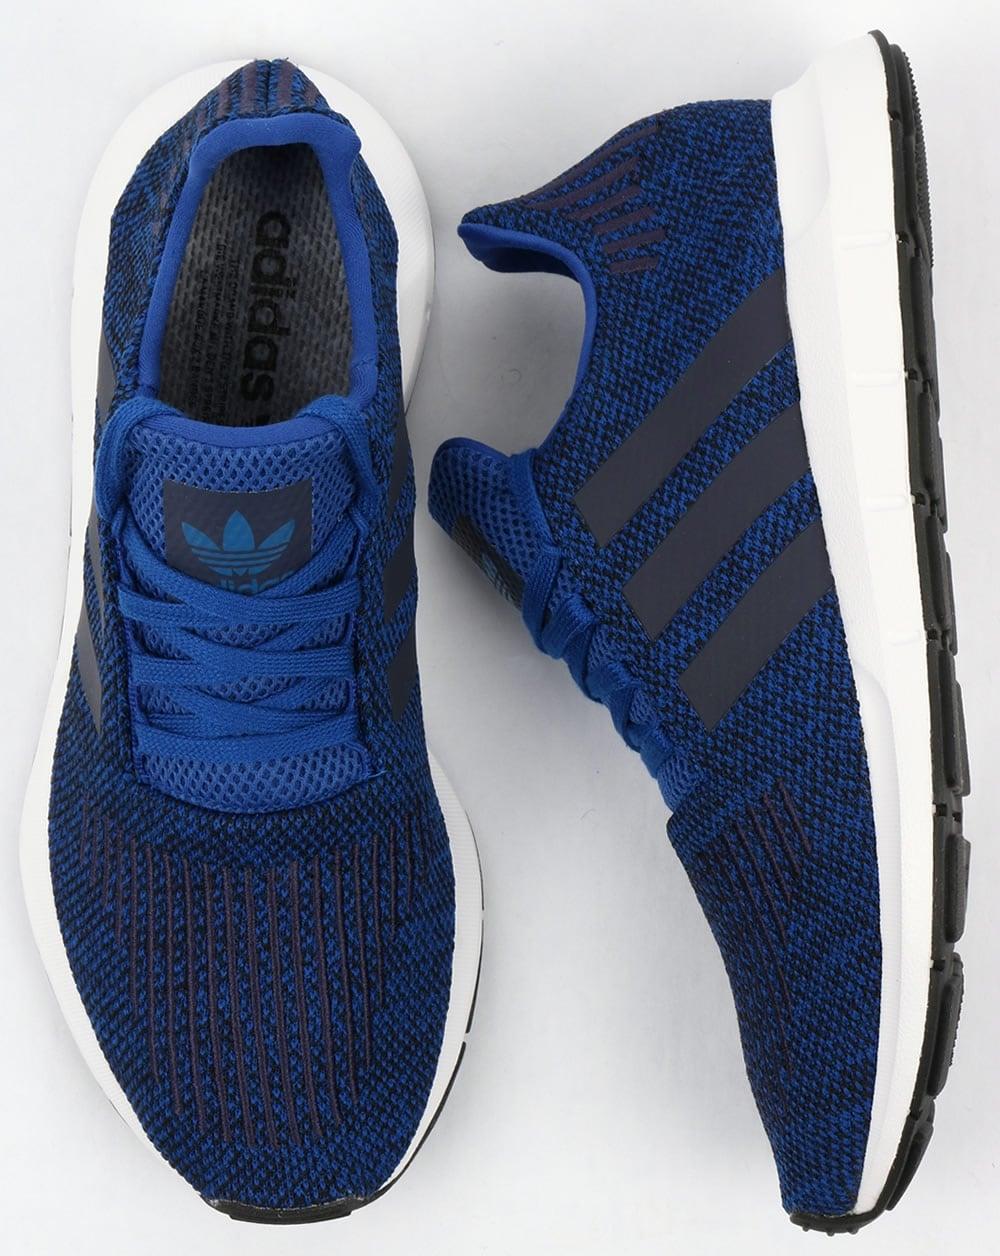 6fe98bb3 Adidas Swift Run Trainers Royal Blue/Ink